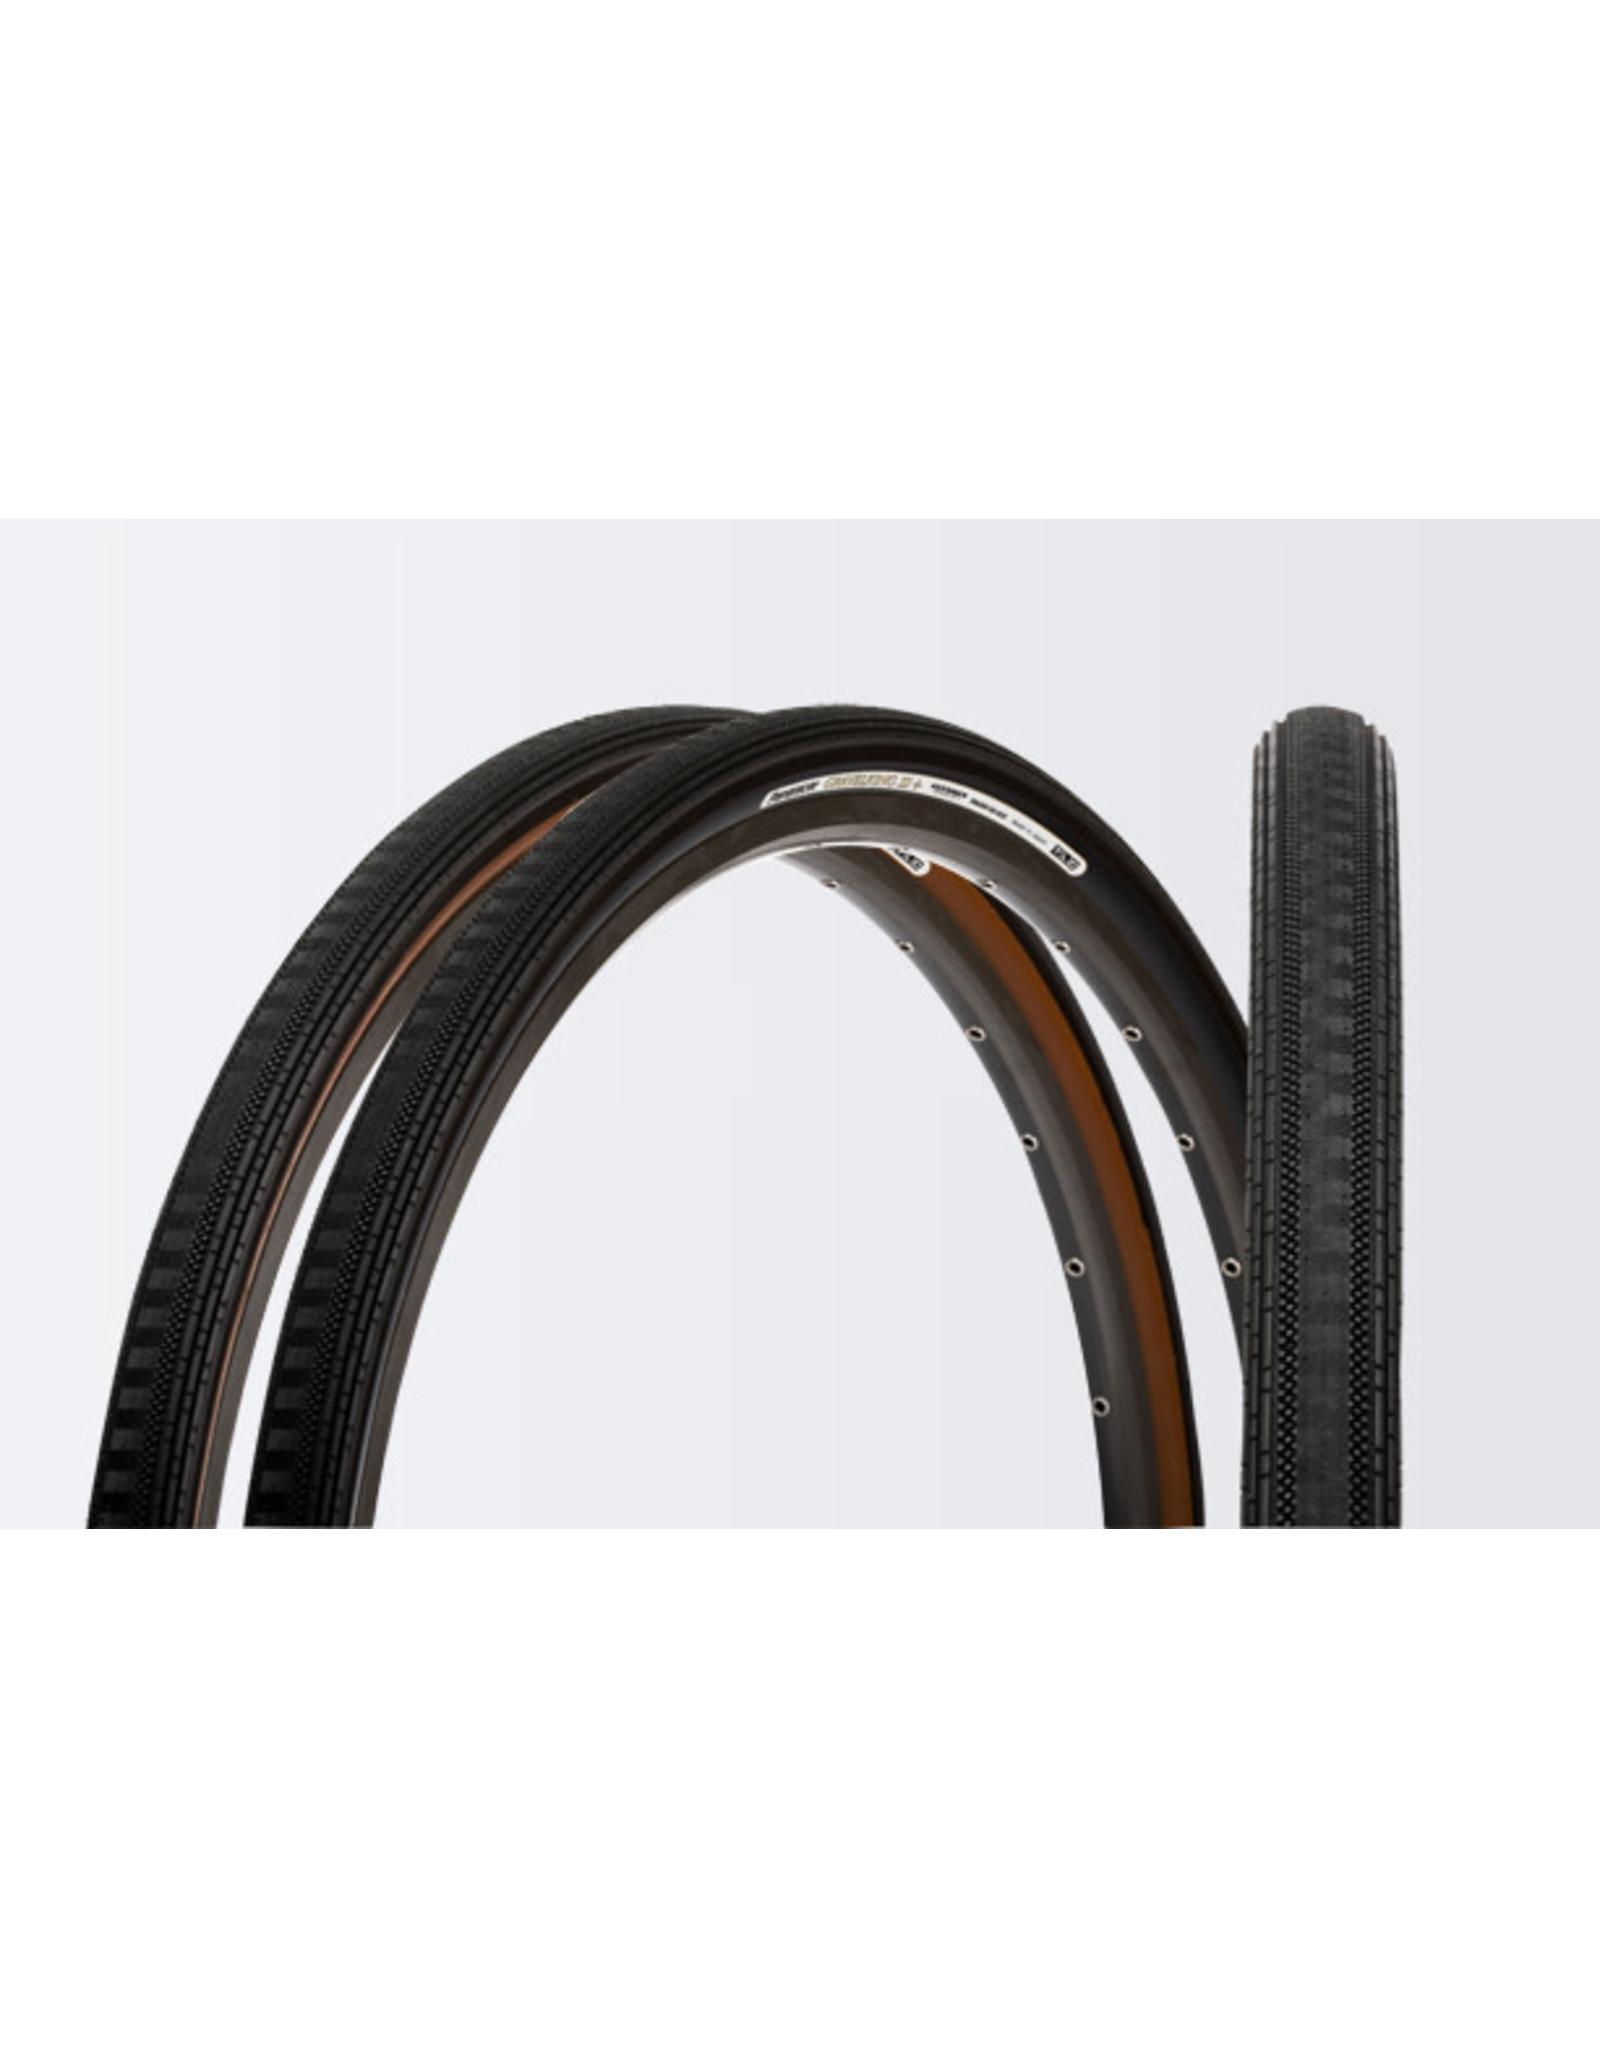 PANARACER PANARACER, Tire, G-King SS TR Brown700 x